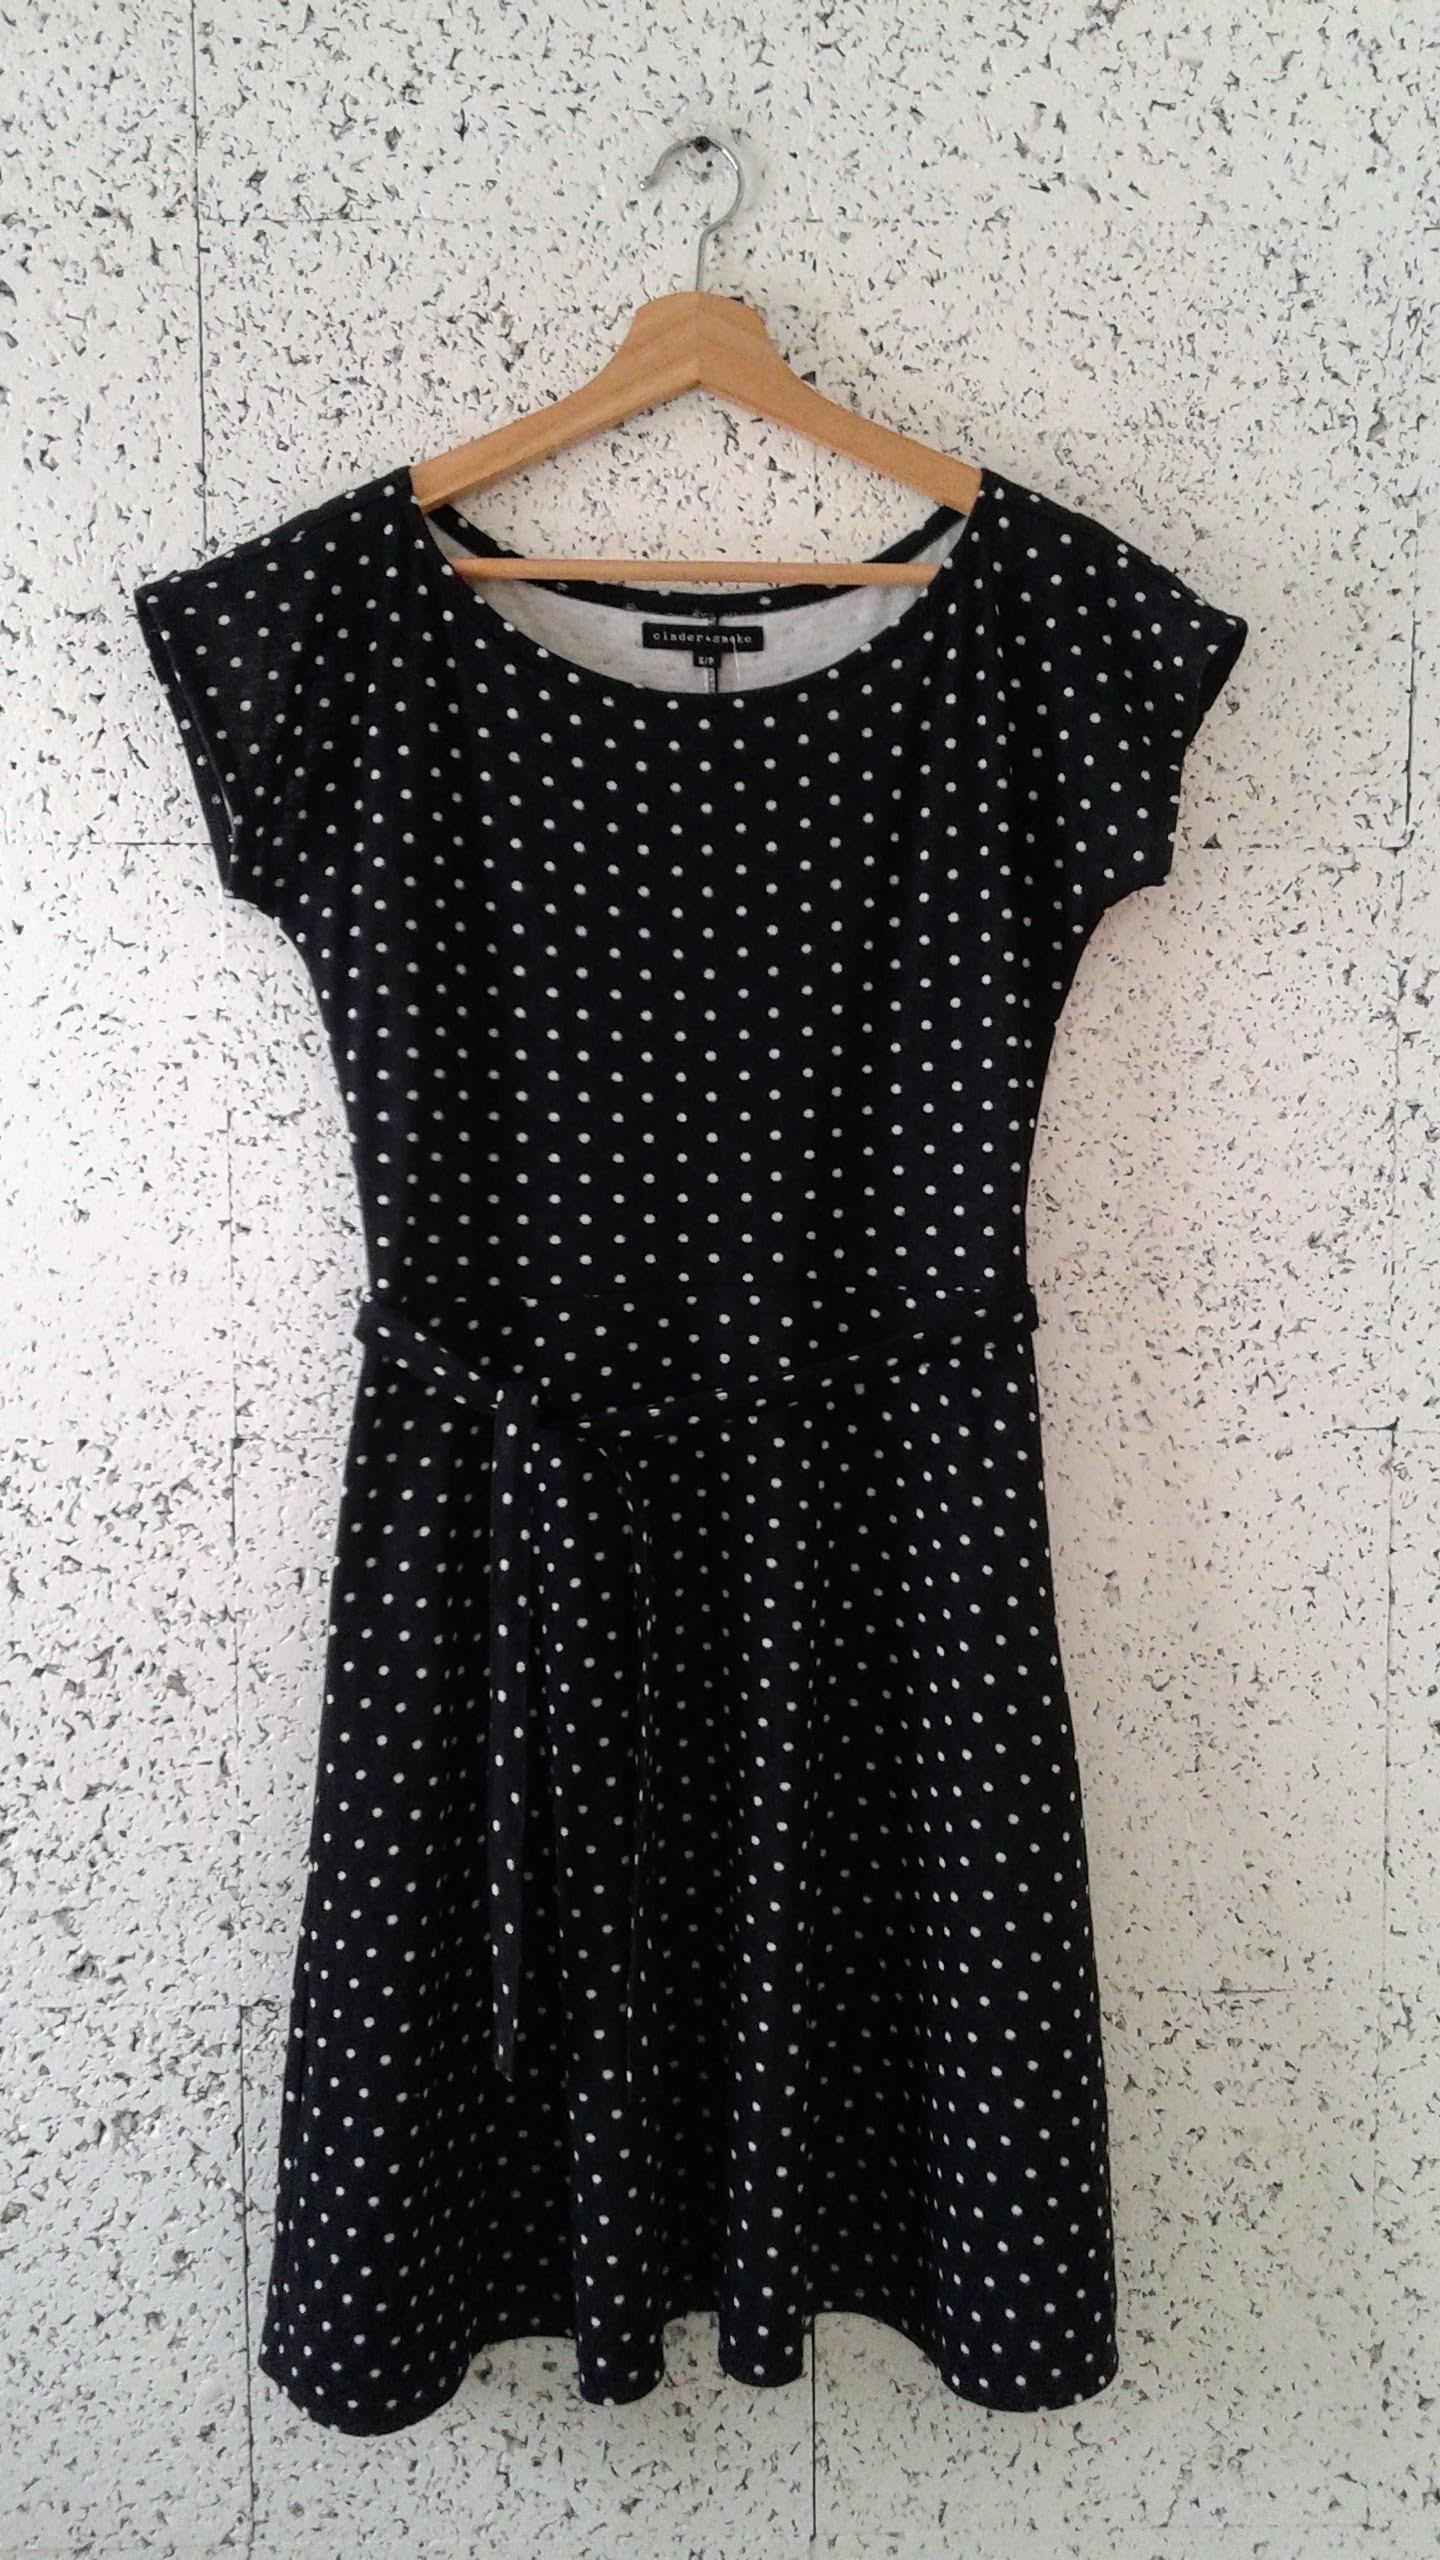 Cinder+Smoke dress; Size S, $36